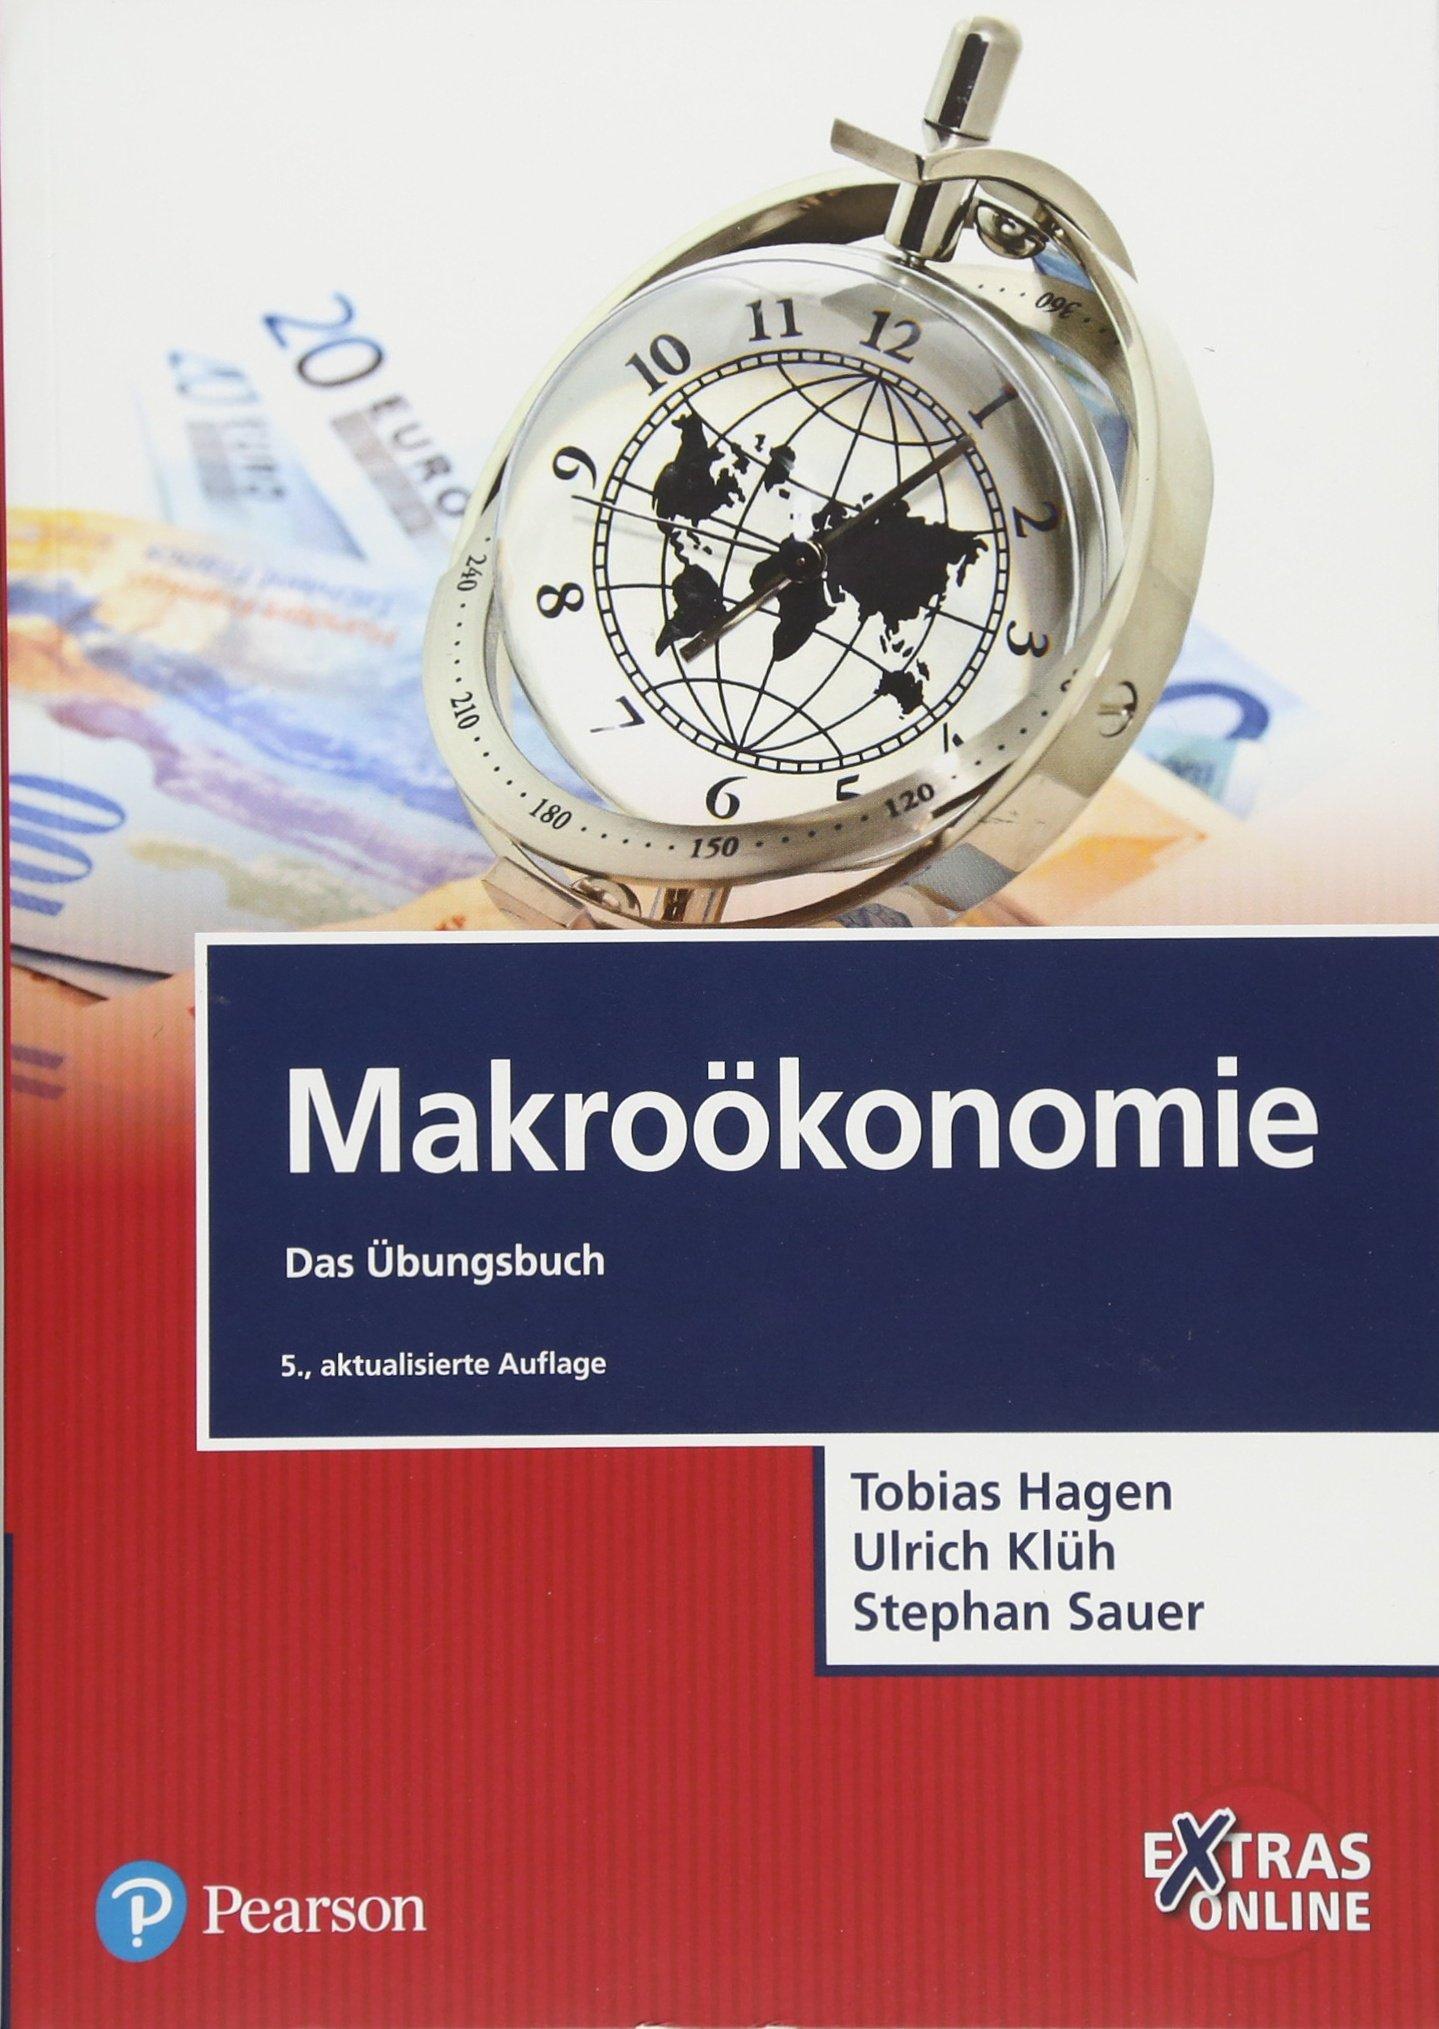 Makroökonomie Übungsbuch (Pearson Studium - Economic VWL) - Tobias ...